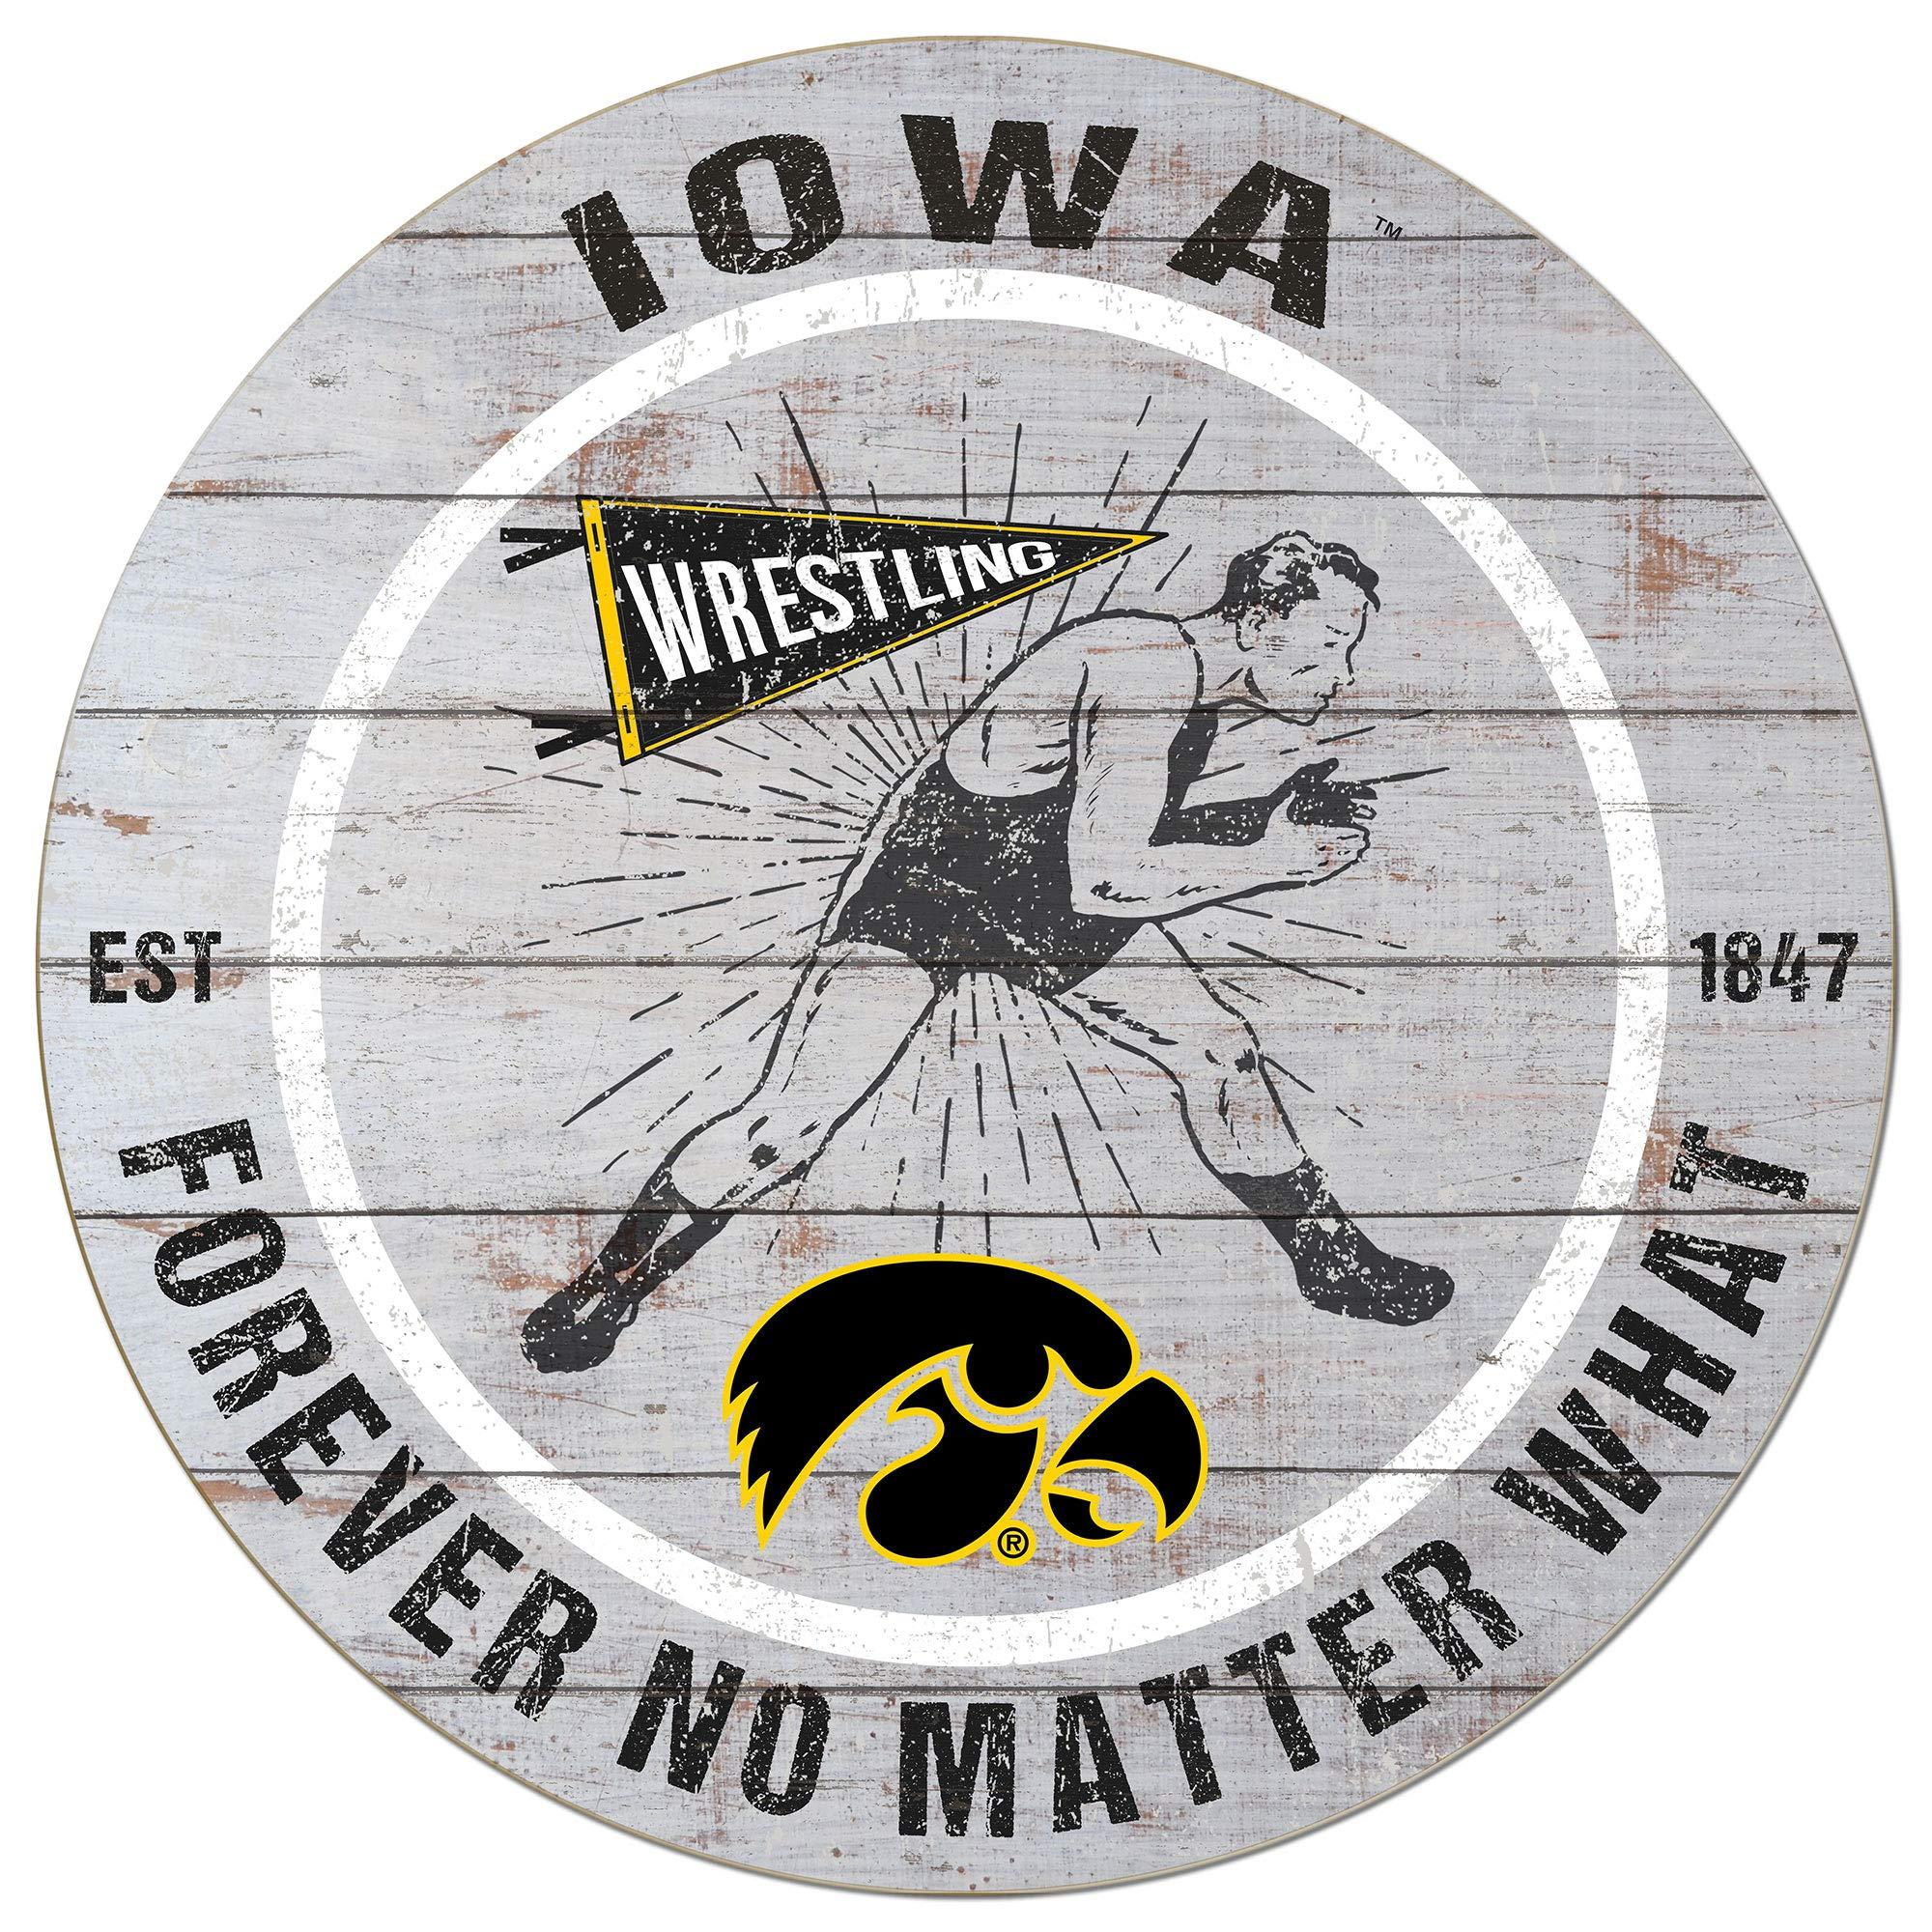 KH Sports Fan 20x20 Weathered Circle - Throwback Iowa Hawkeyes Wrestling by KH Sports Fan